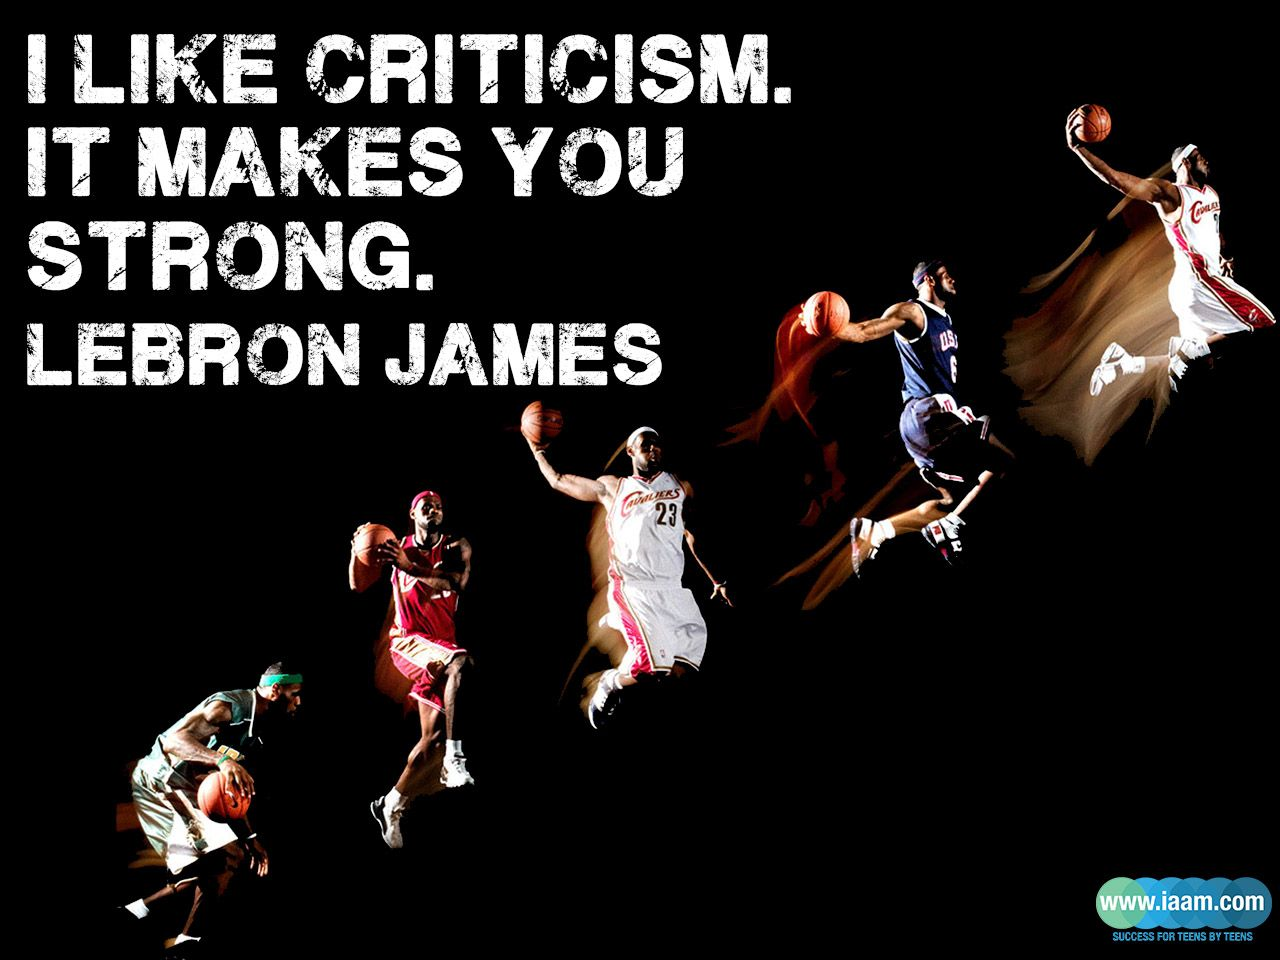 LeBron James quote. Lebron james quotes, Lebron james